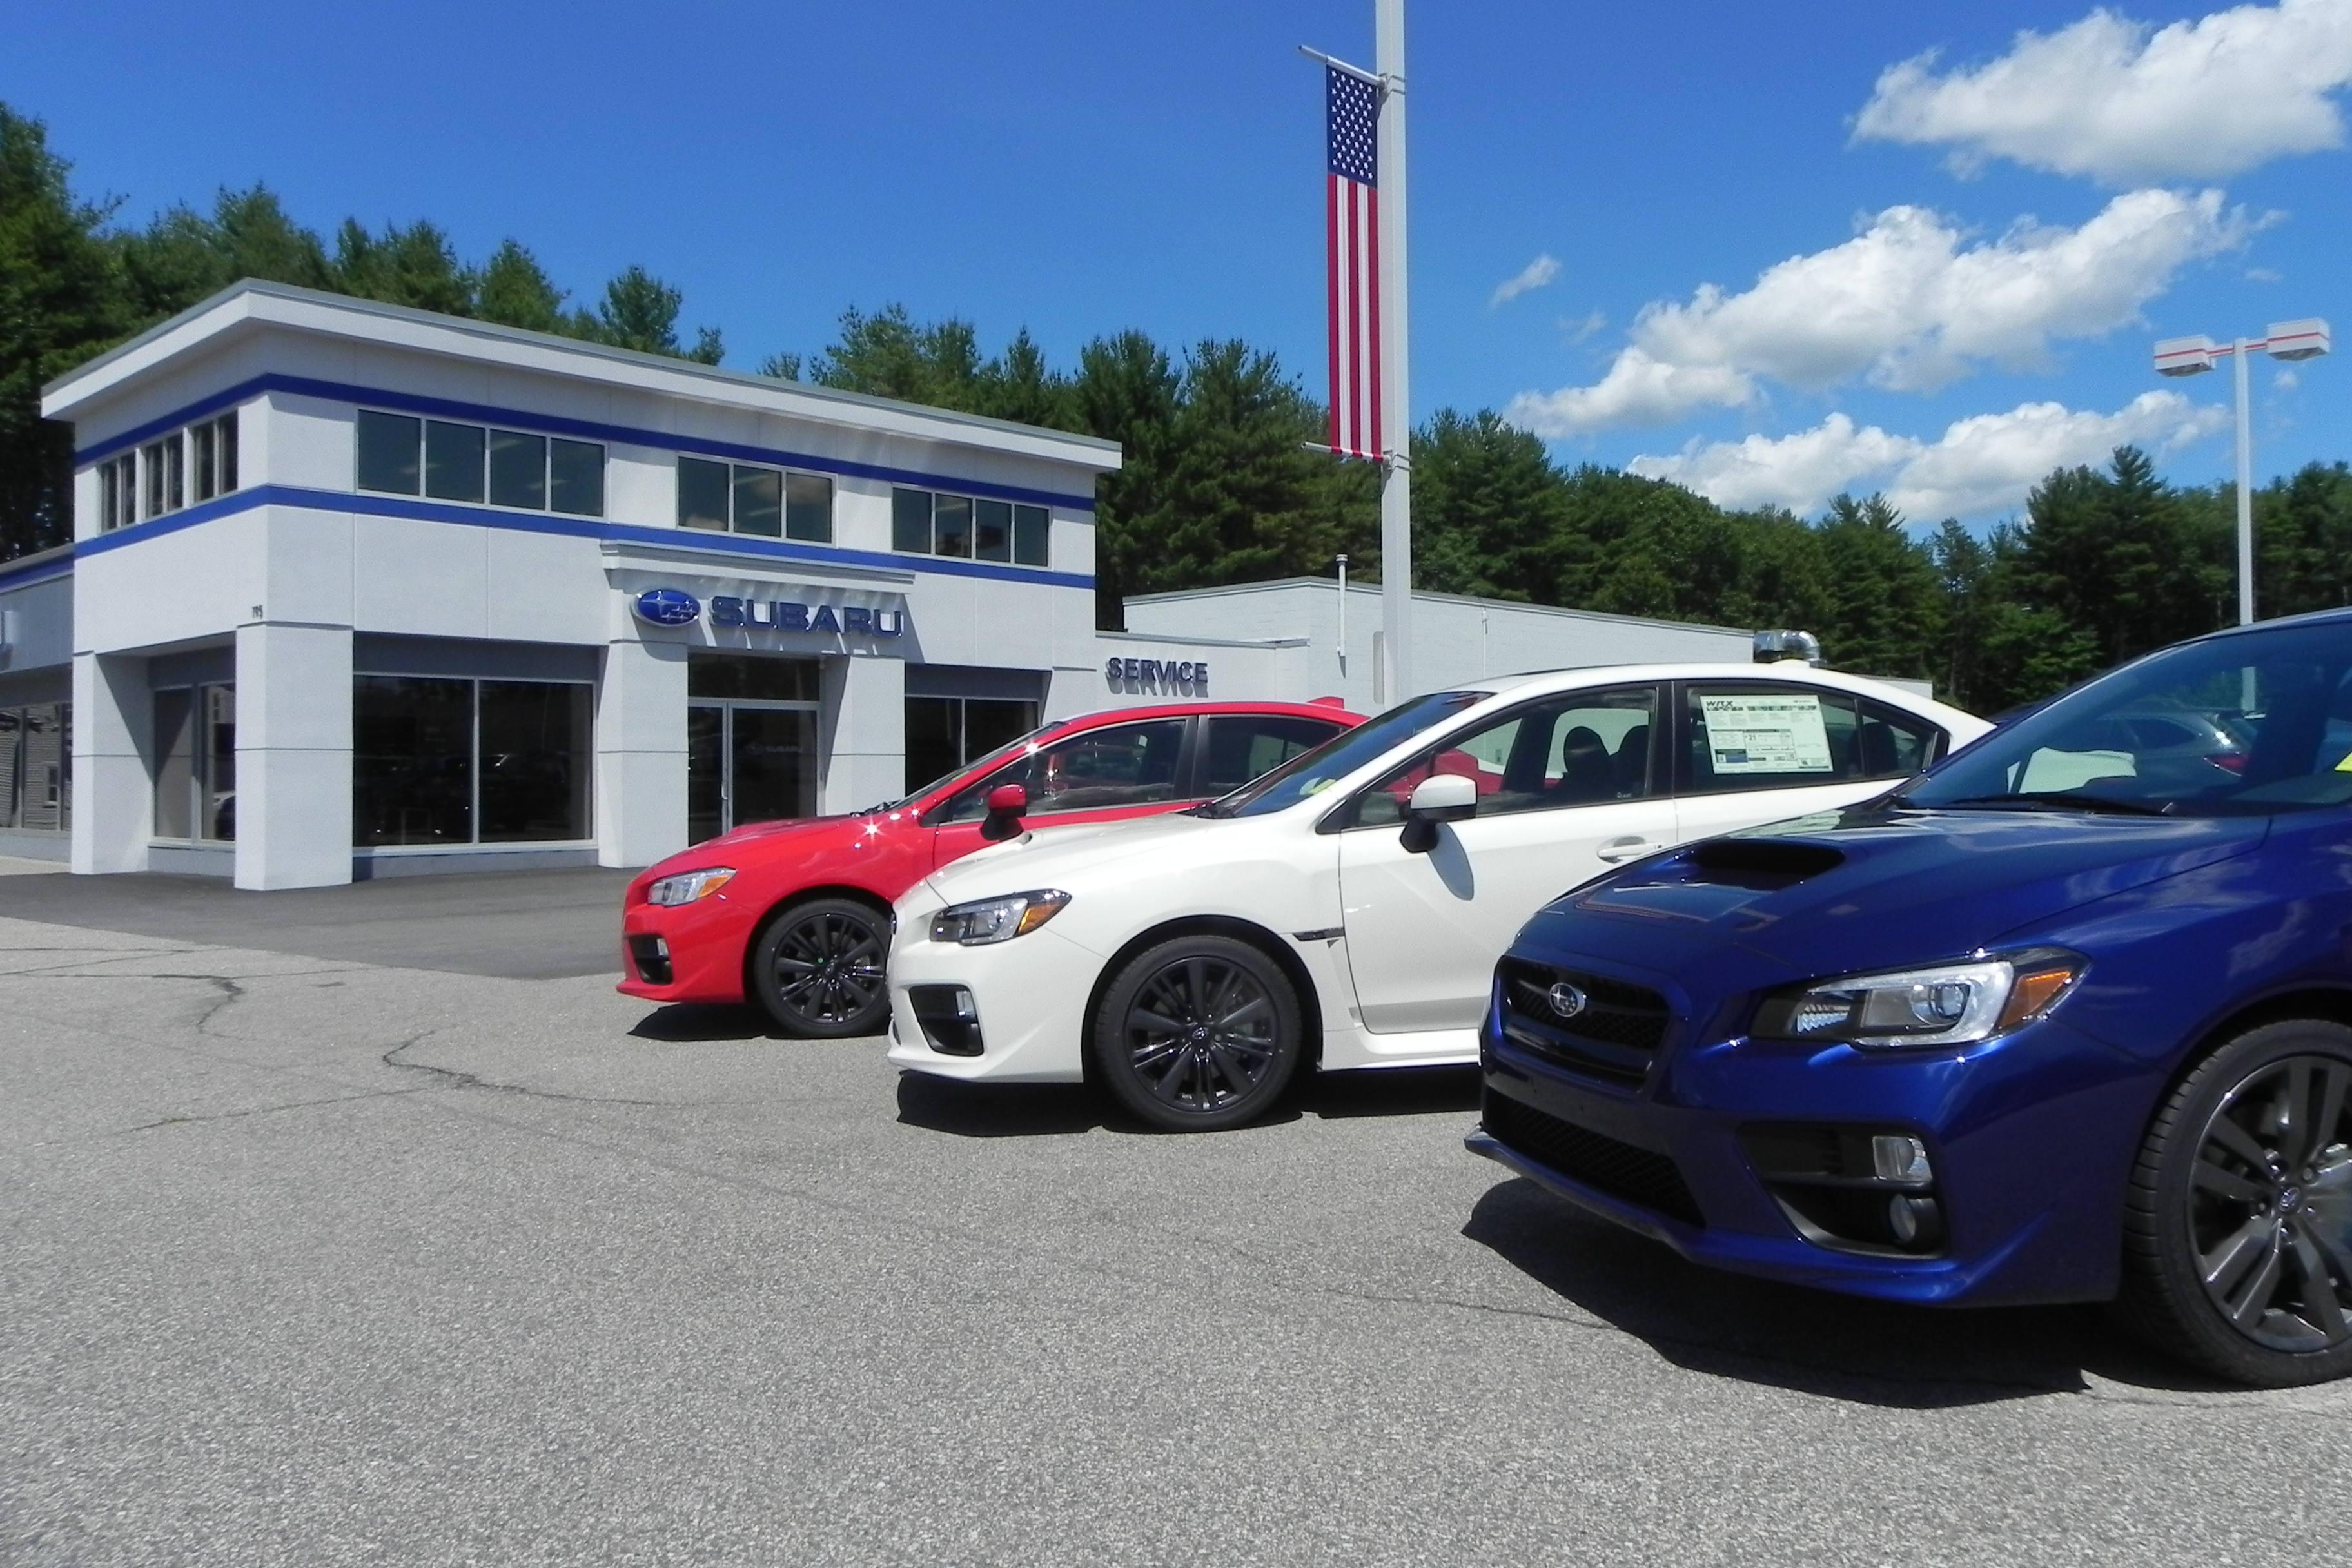 Tri City Subaru: Subaru Dealership Somersworth NH